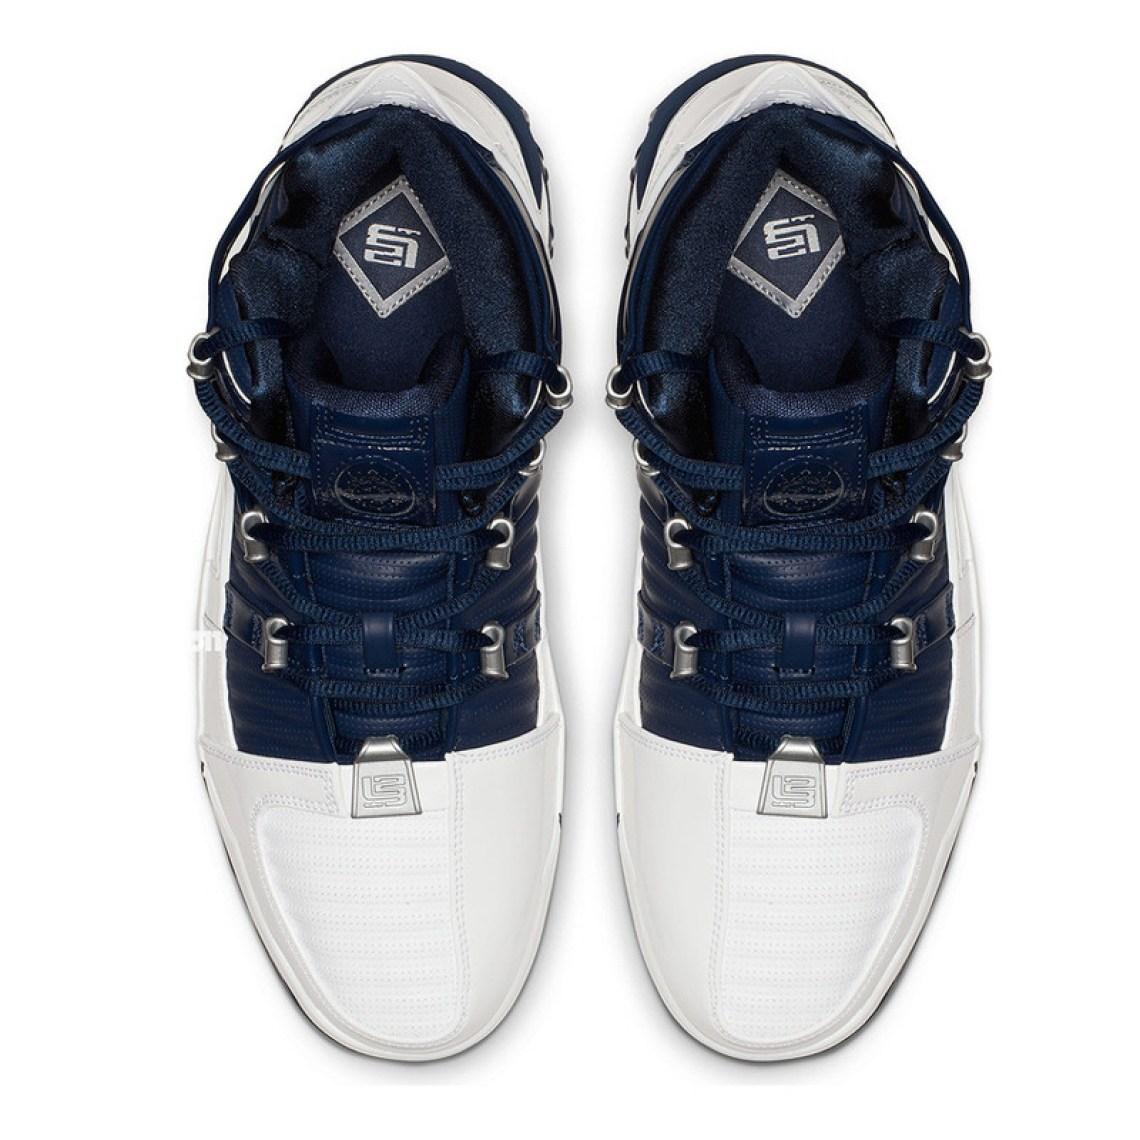 74a031cc0f787 Nike Zoom LeBron 3 Midnight Navy